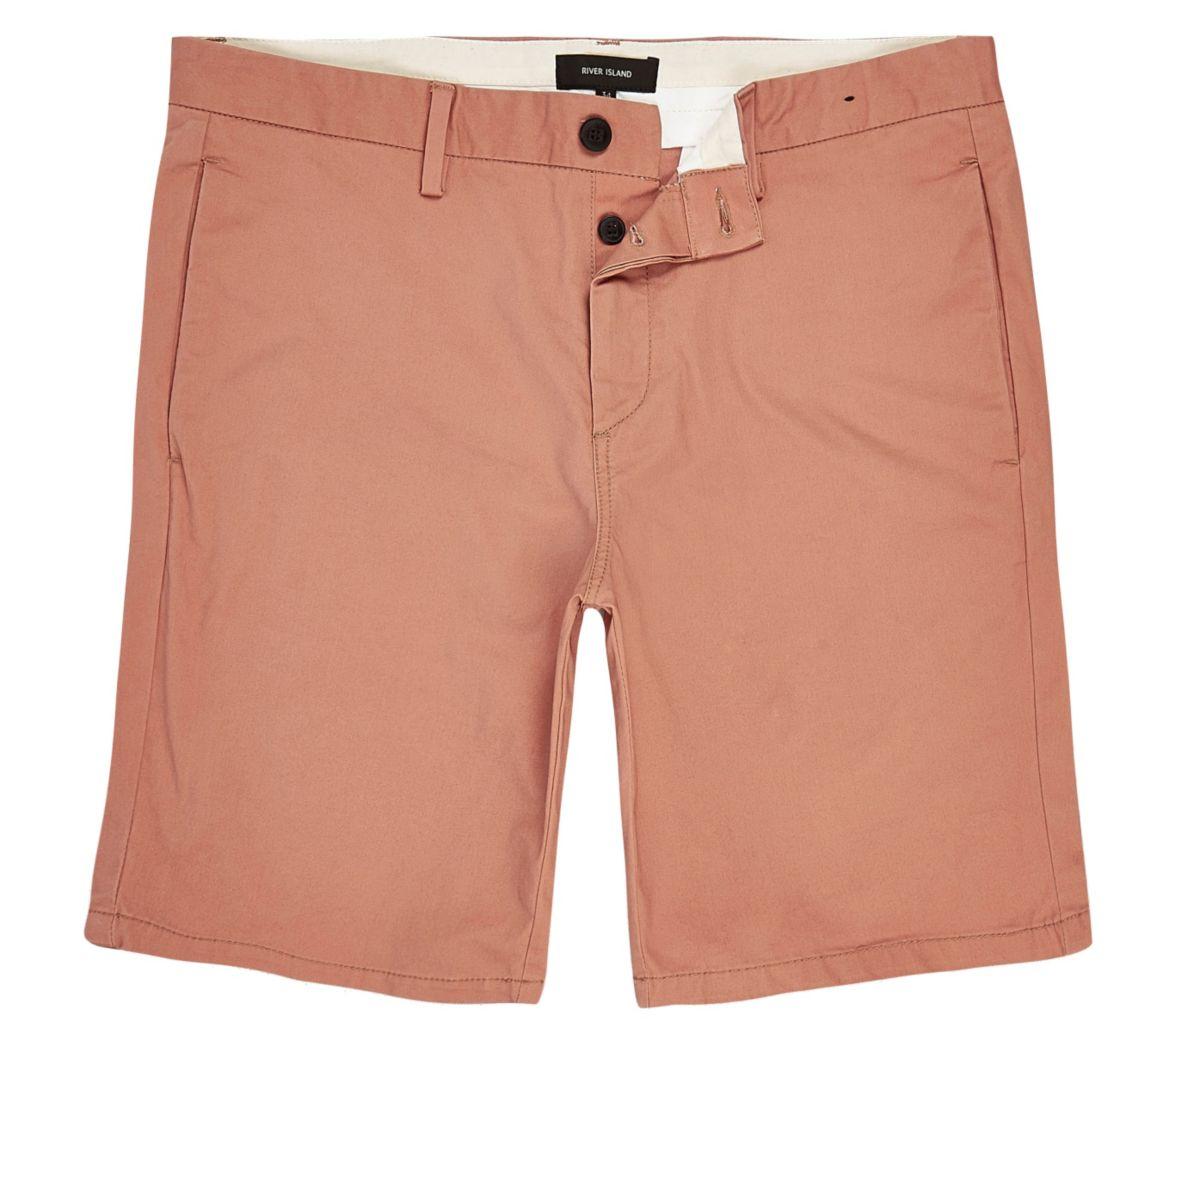 Coral slim fit chino shorts